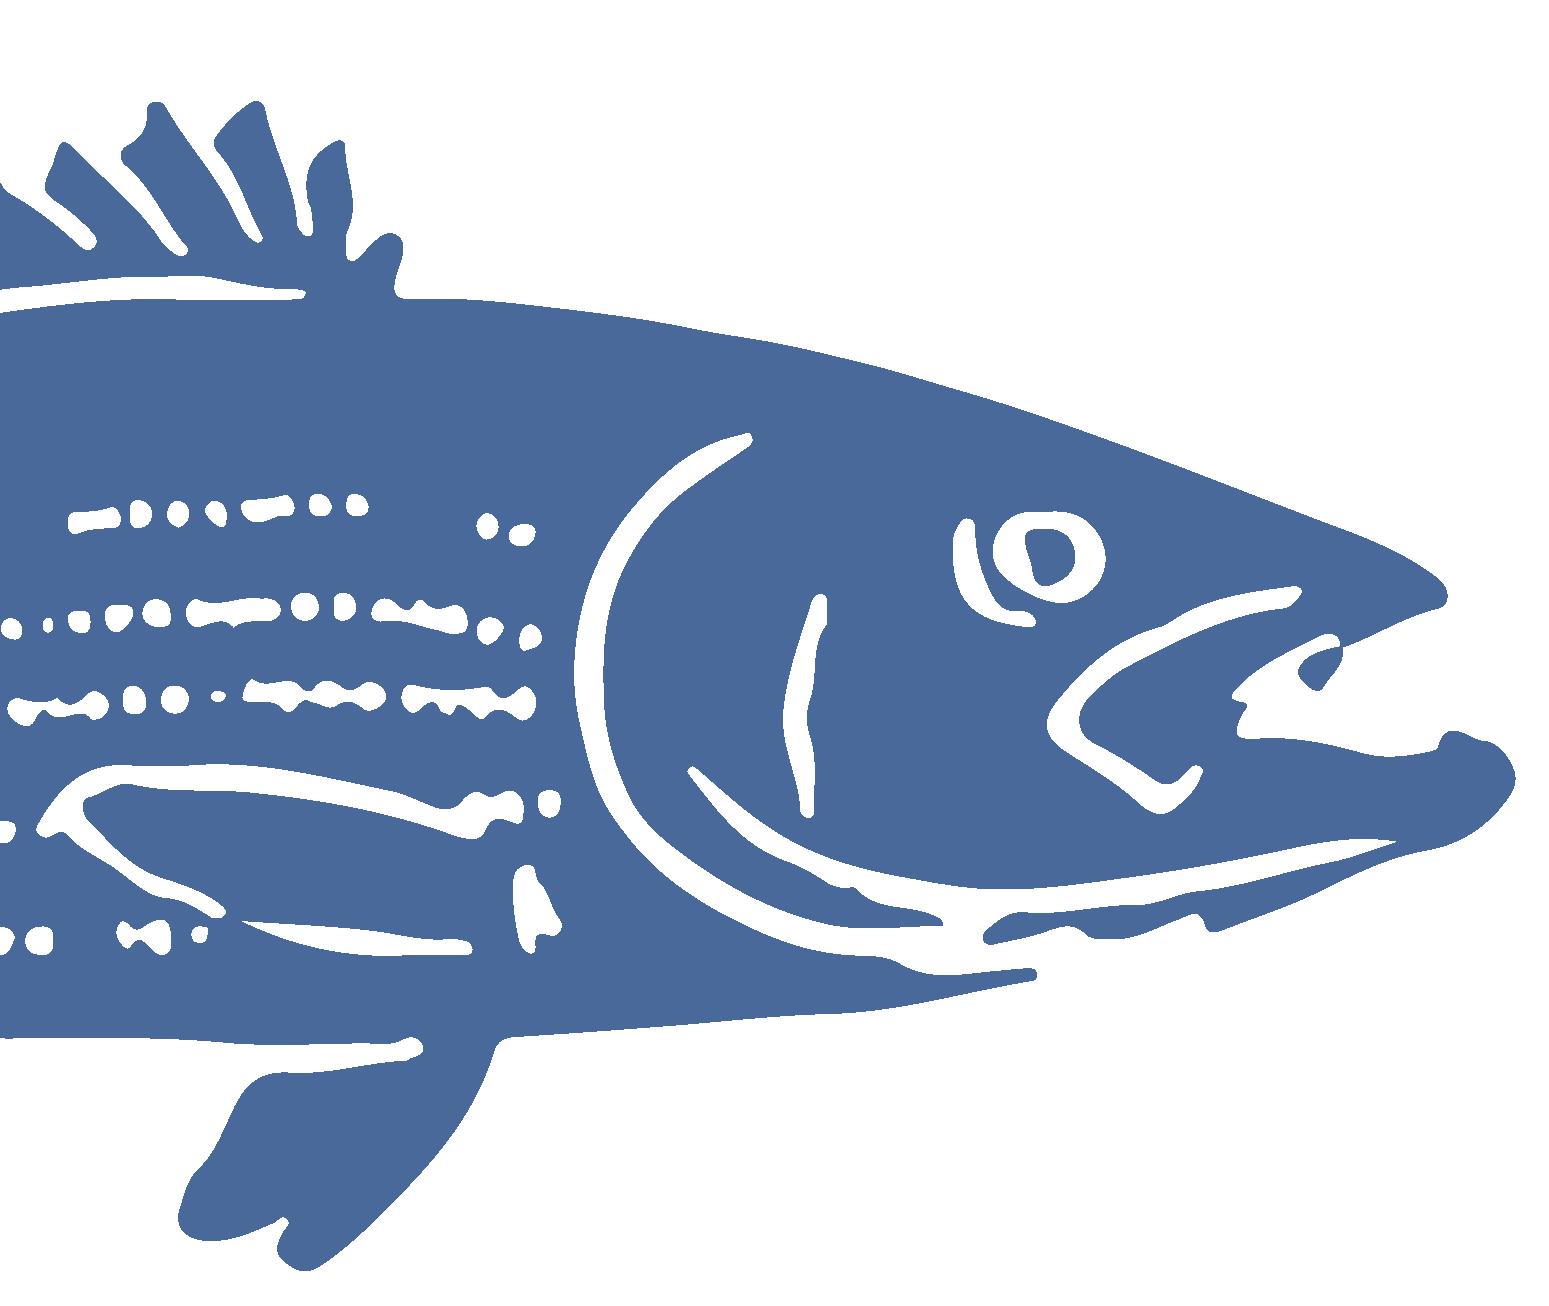 FishHead-01.png